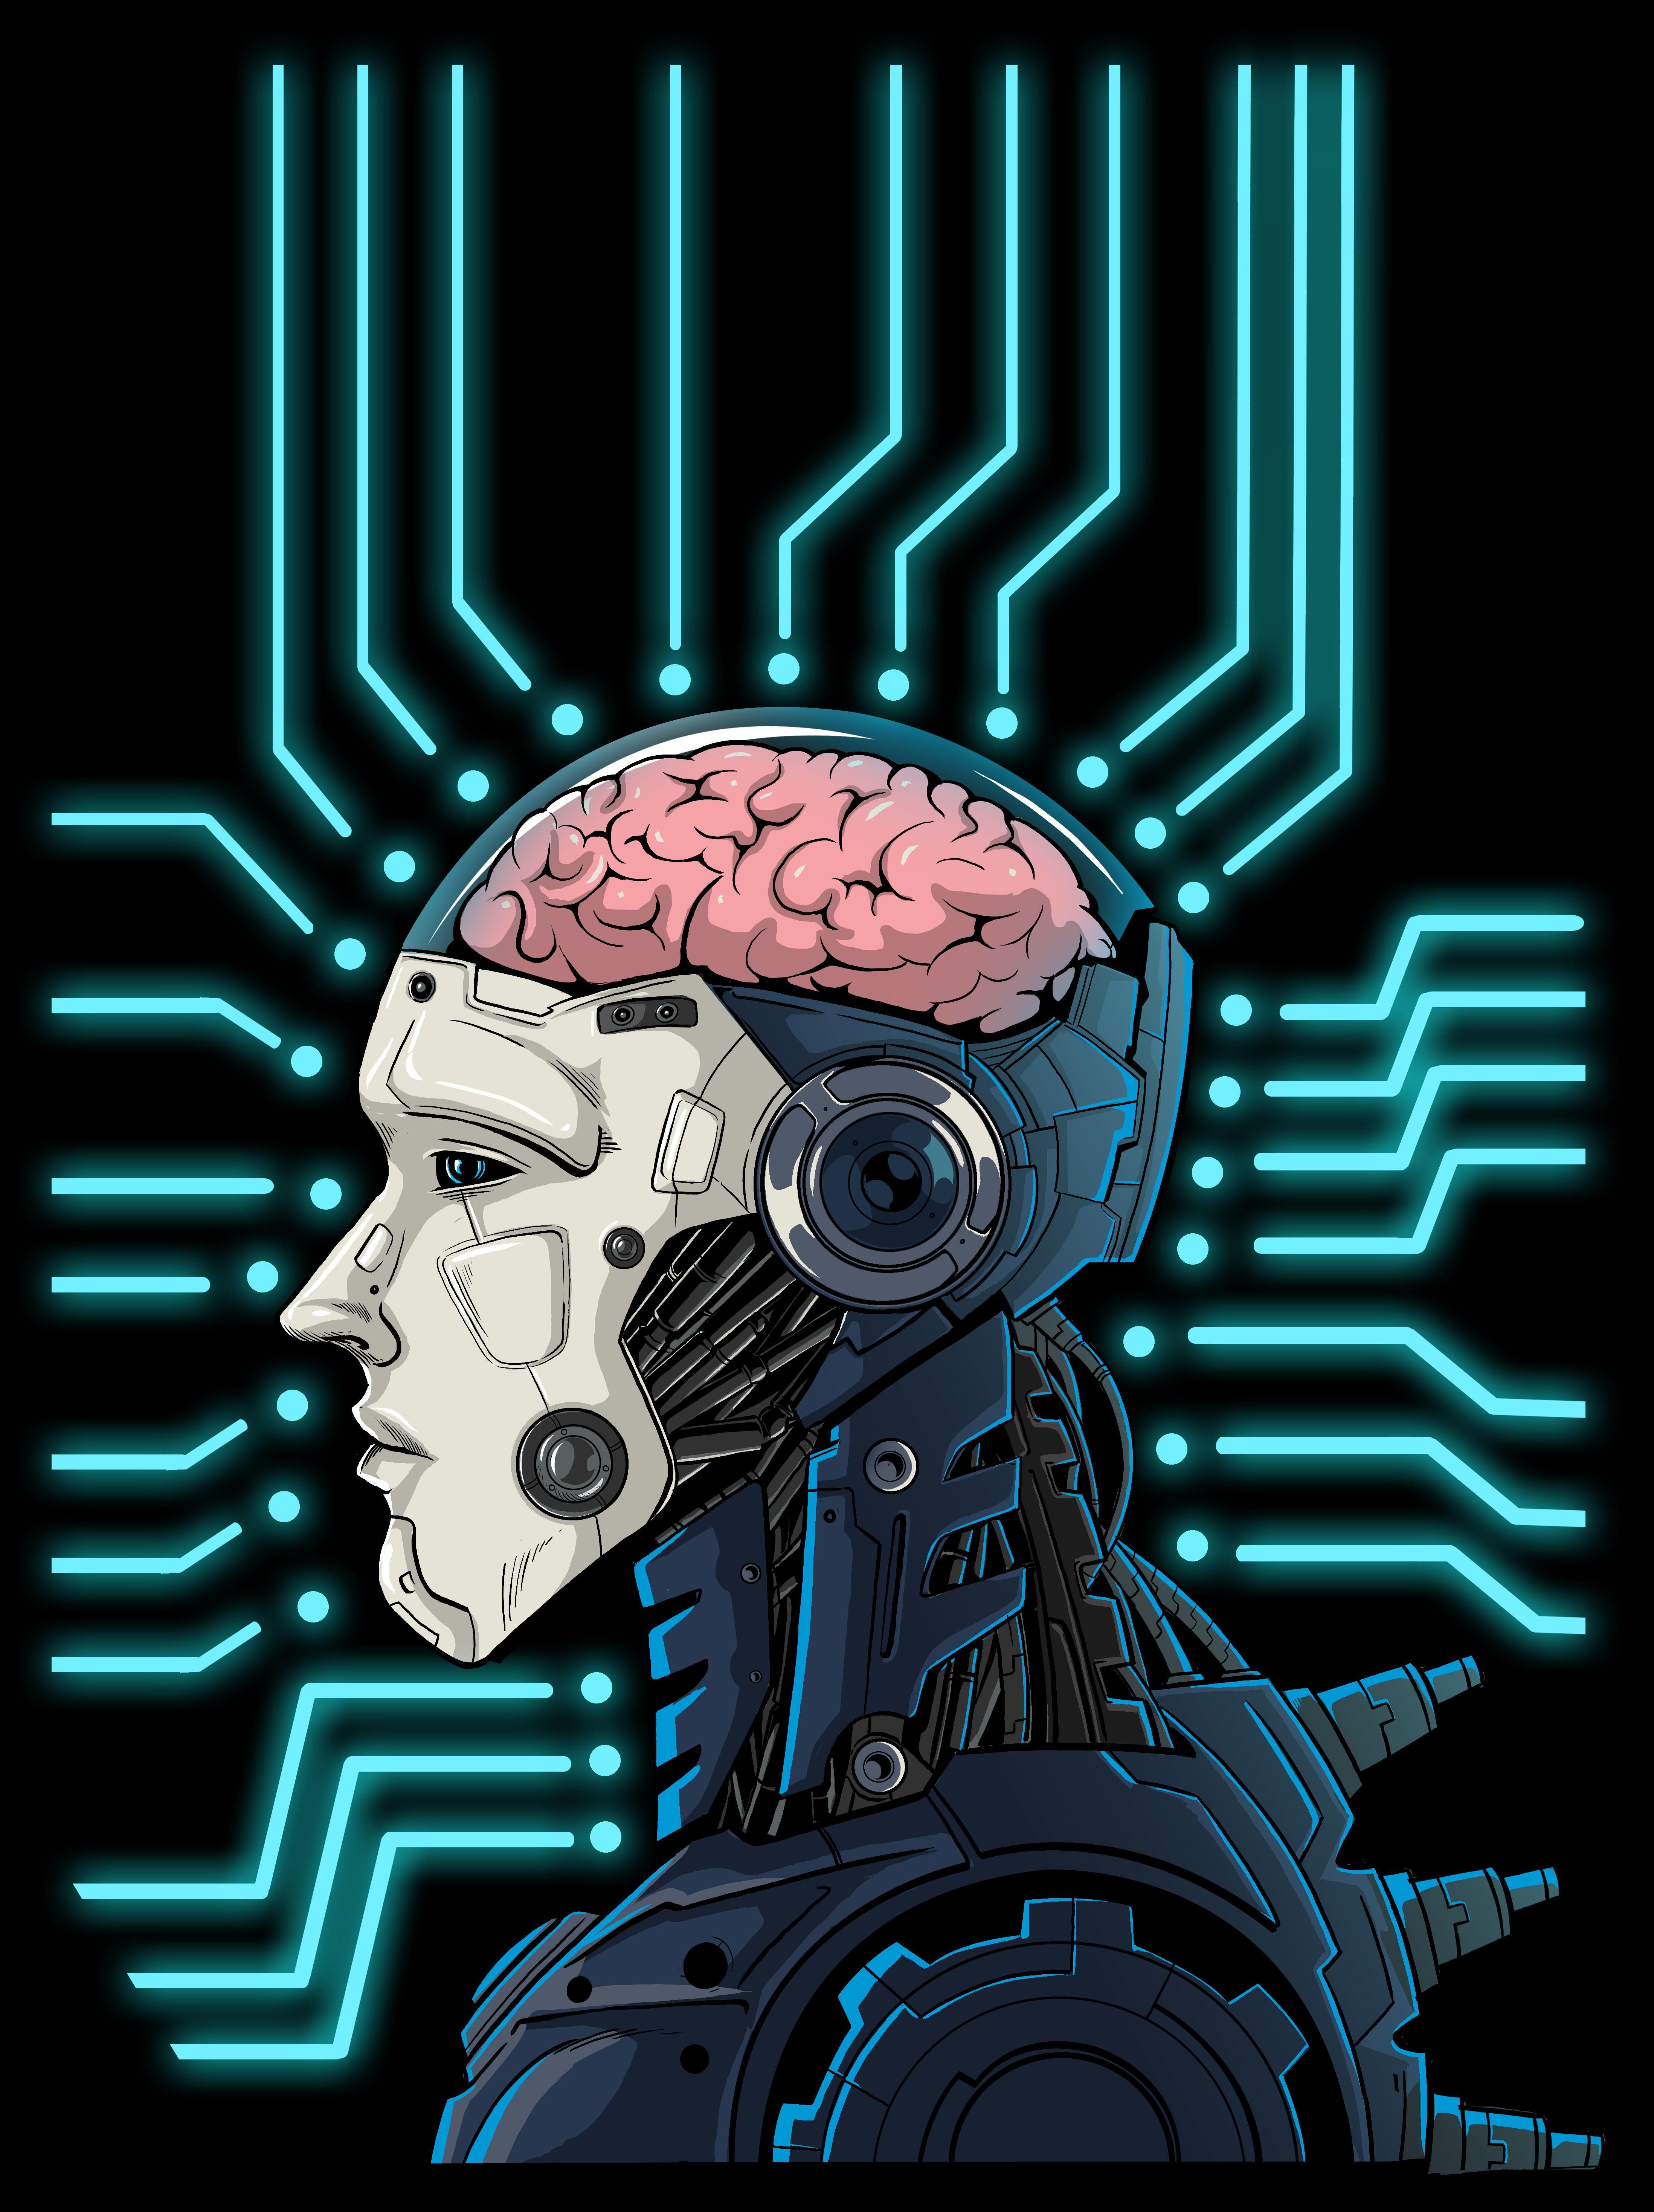 T-shirts for Biomechanics and Neuromuscular Company